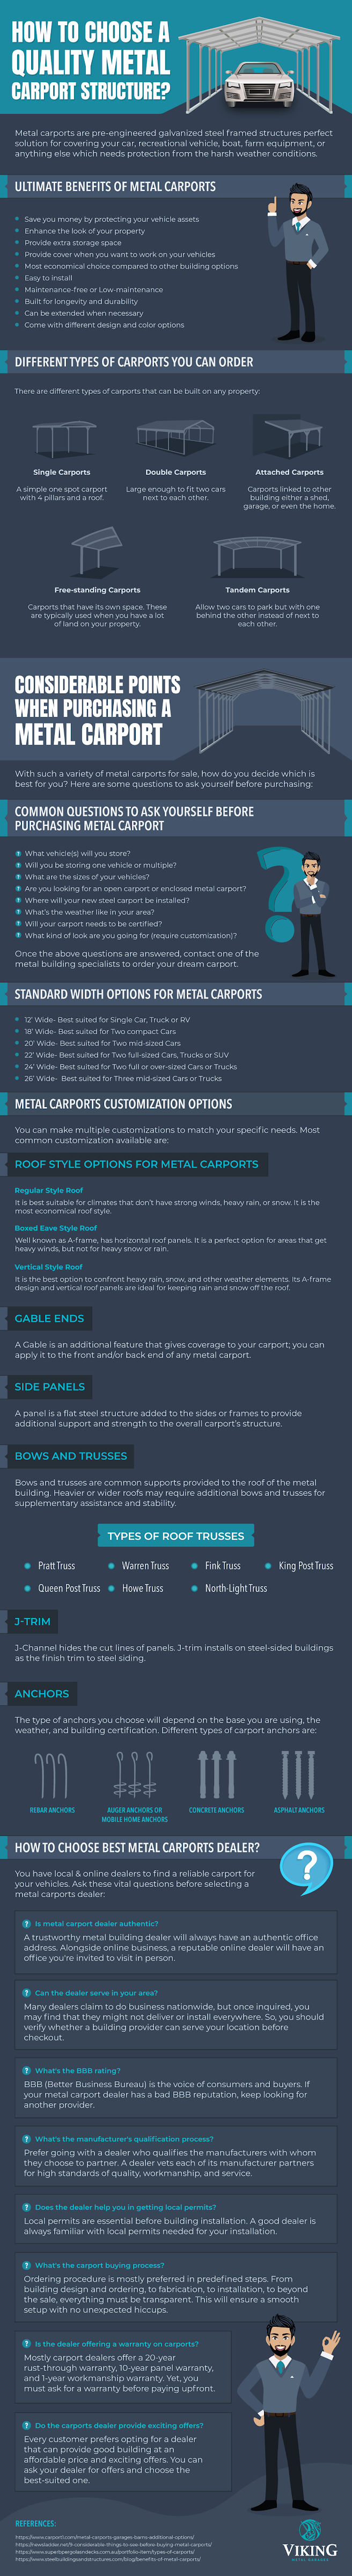 How to Choose A Quality Metal Carport Structure? #infographic #Construction #infographics #Metal Carport